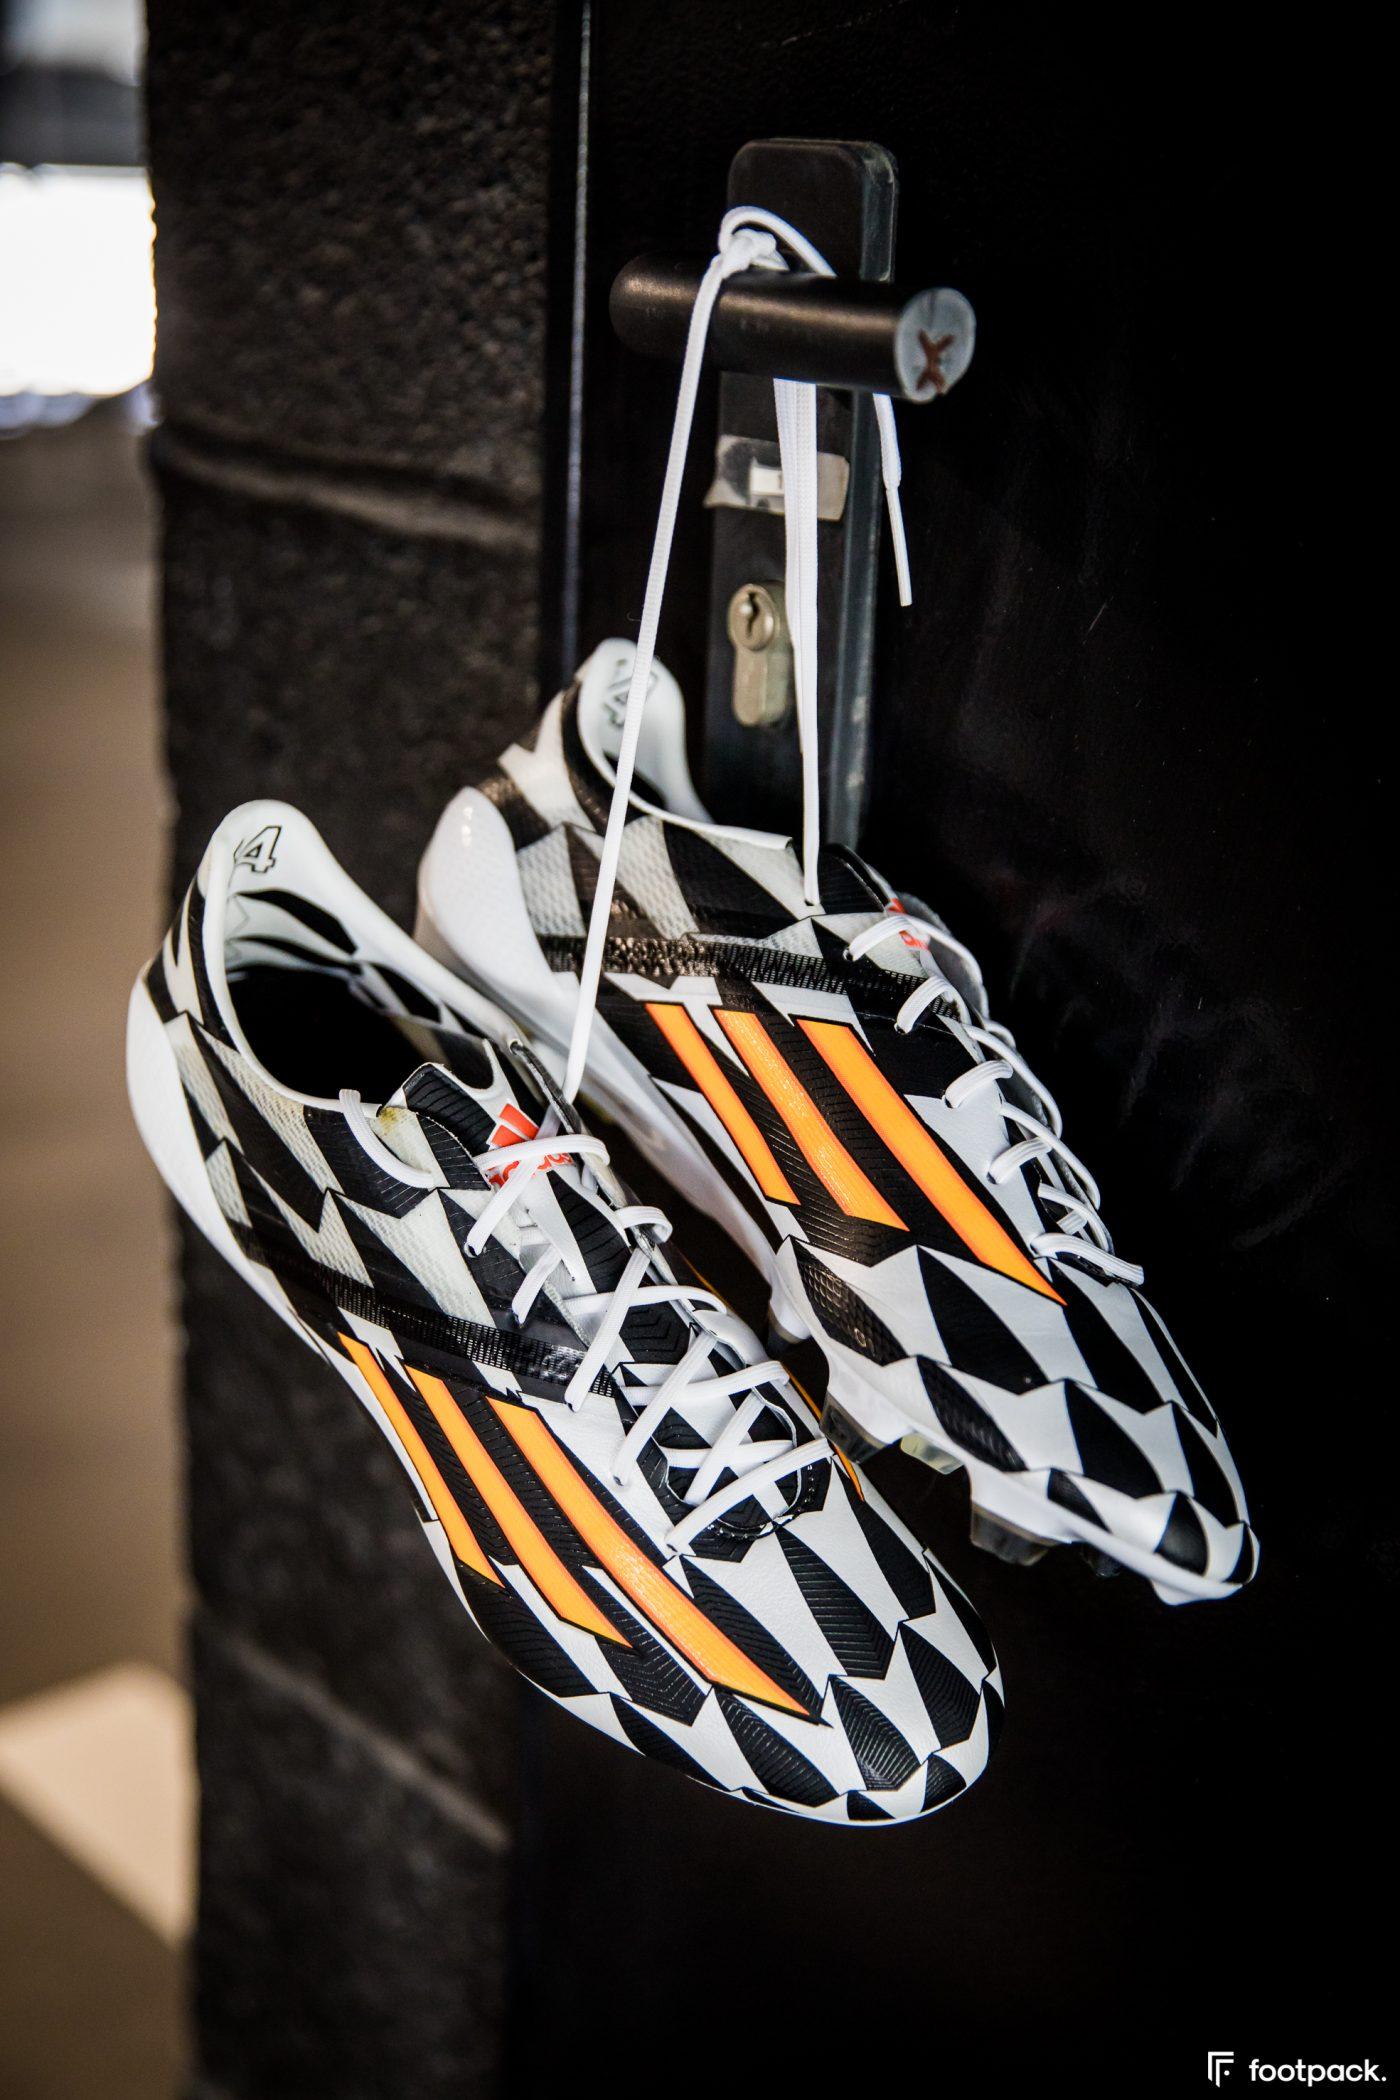 adidas-F50-adizero-battle-pack-coupe-du-monde-2014-footpack-10